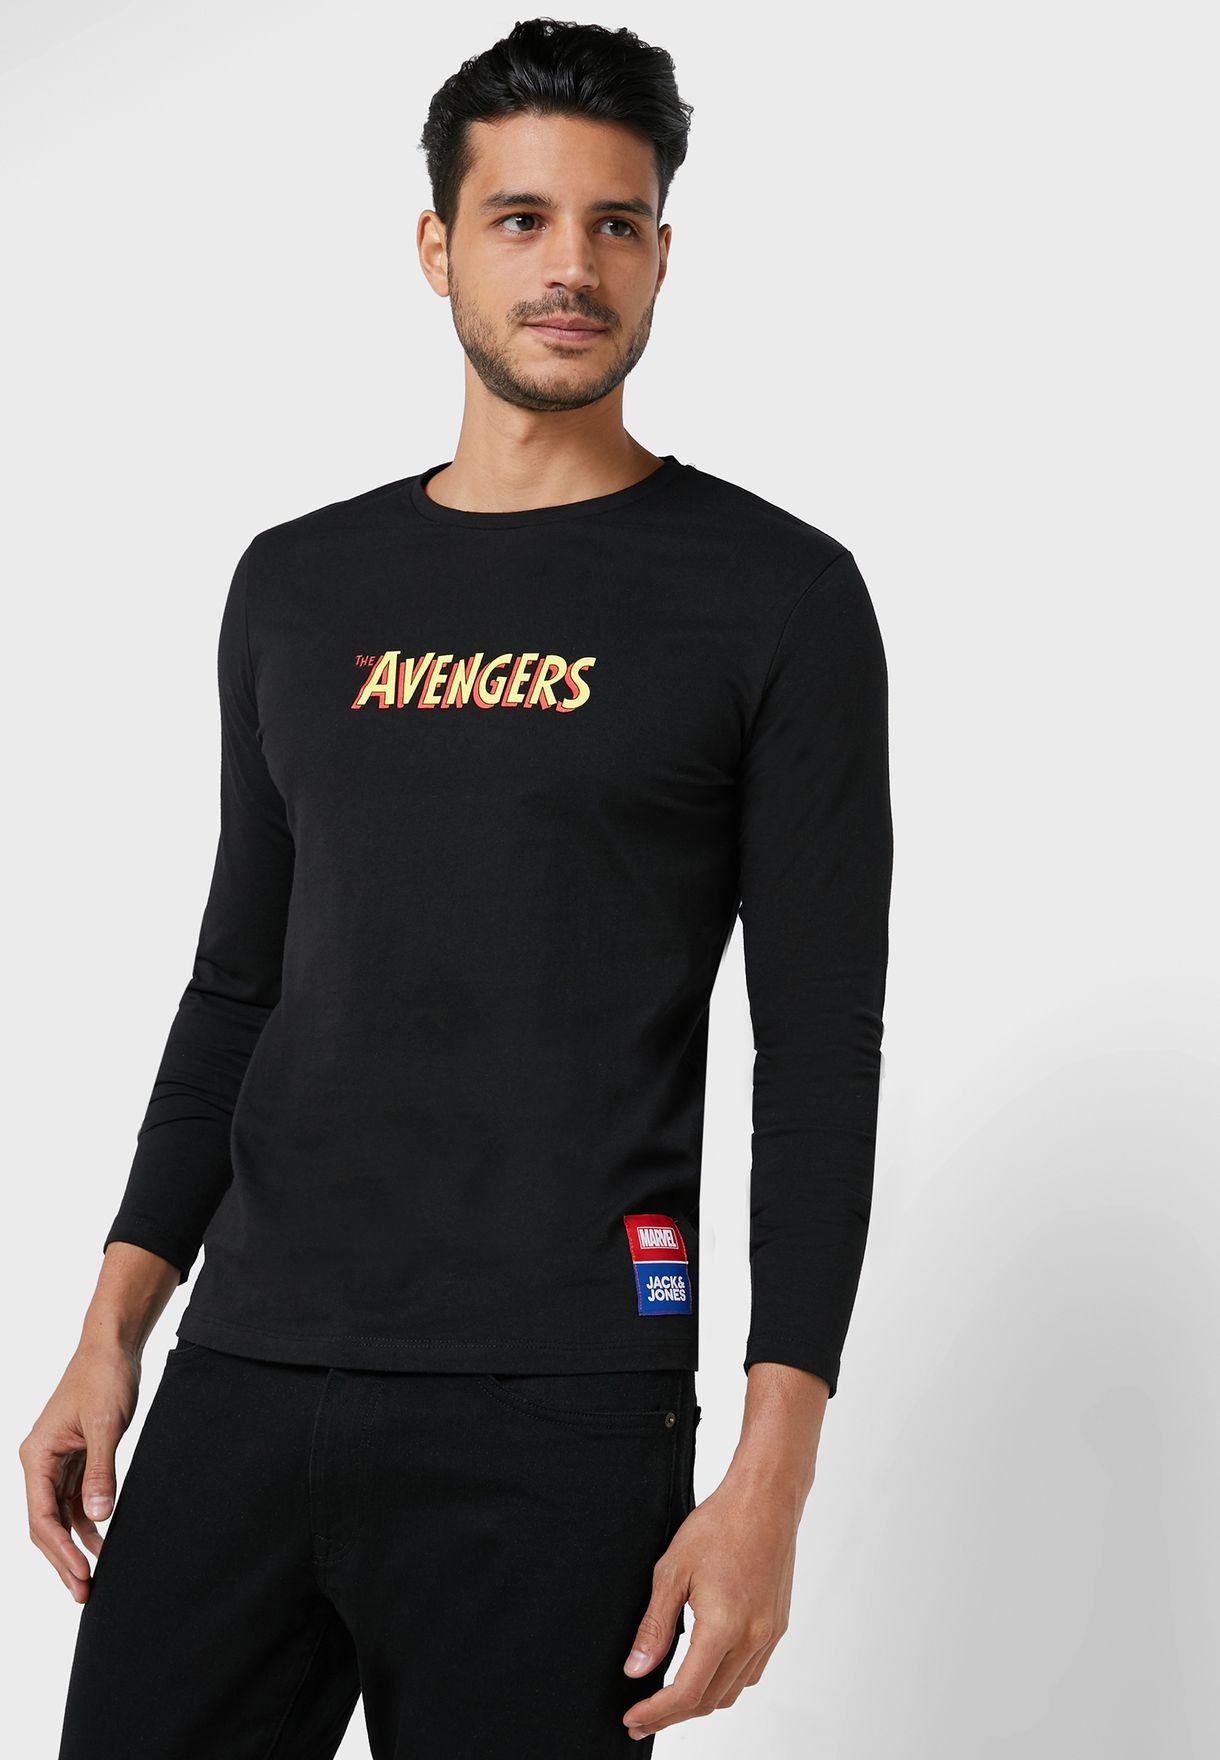 Avengers Crew Neck T-Shirt